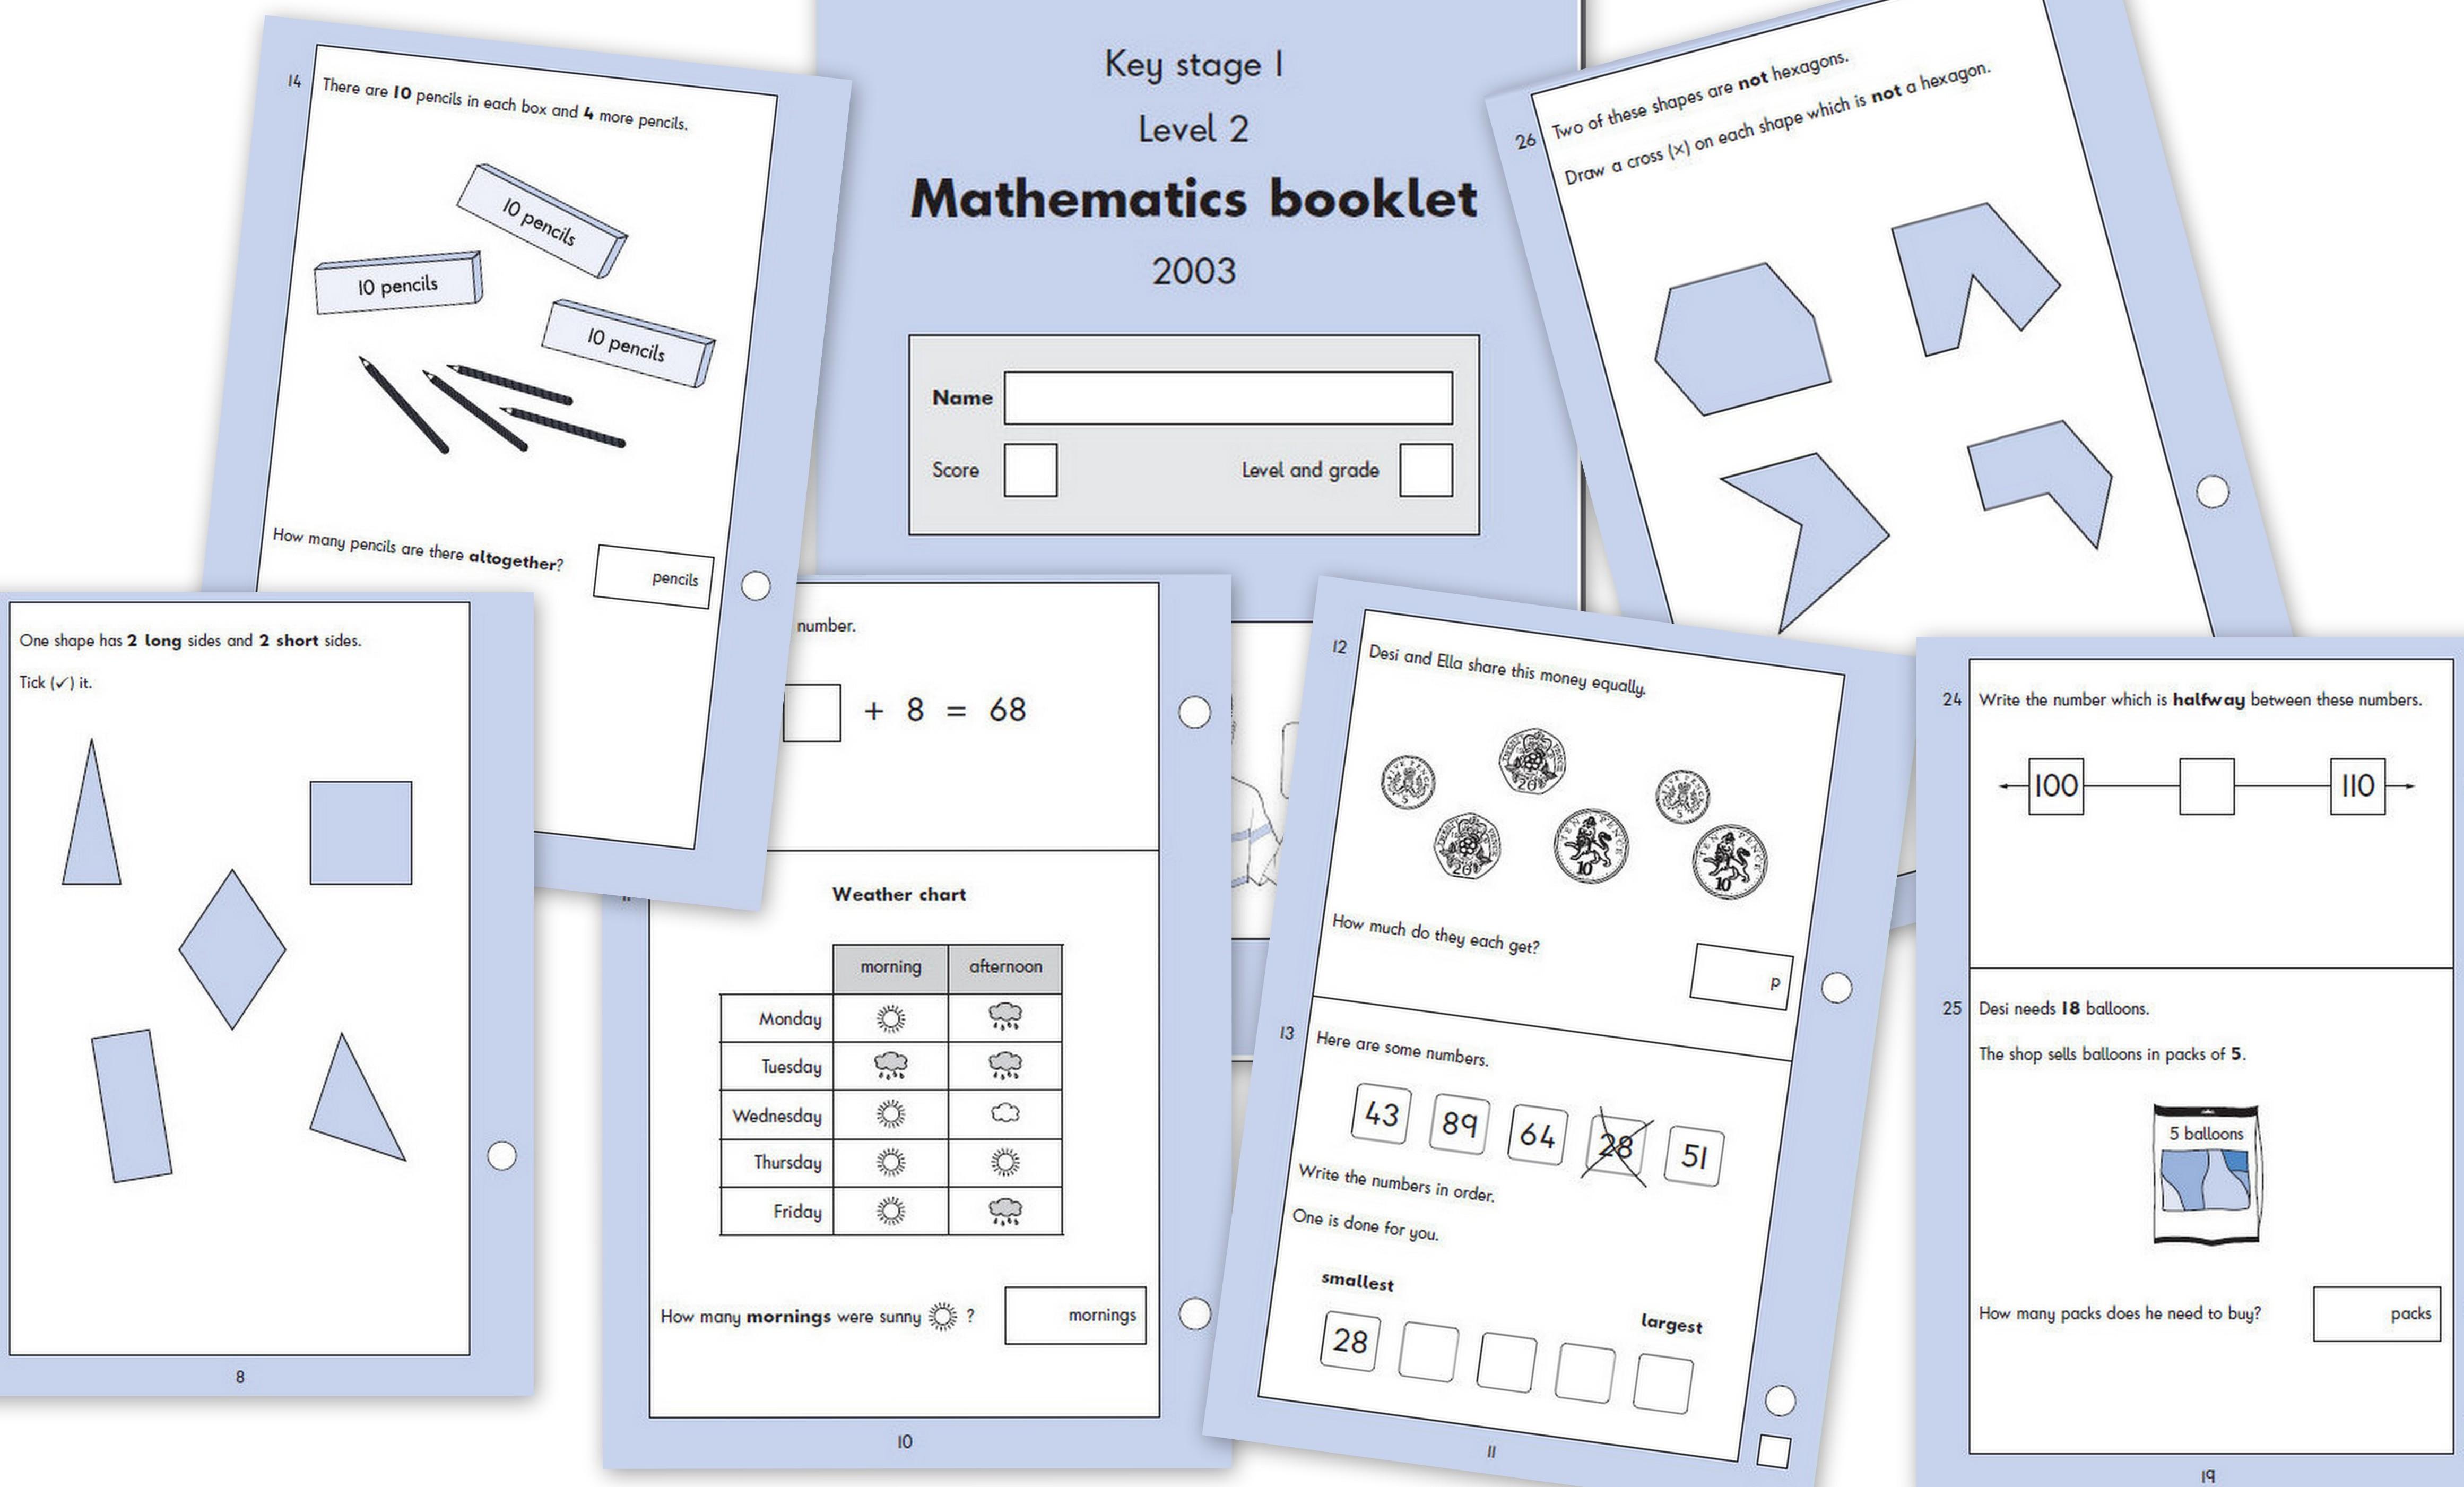 Ini Bocoran Soal Ujian Matematika Year 2 Oleh Septin Puji Astuti